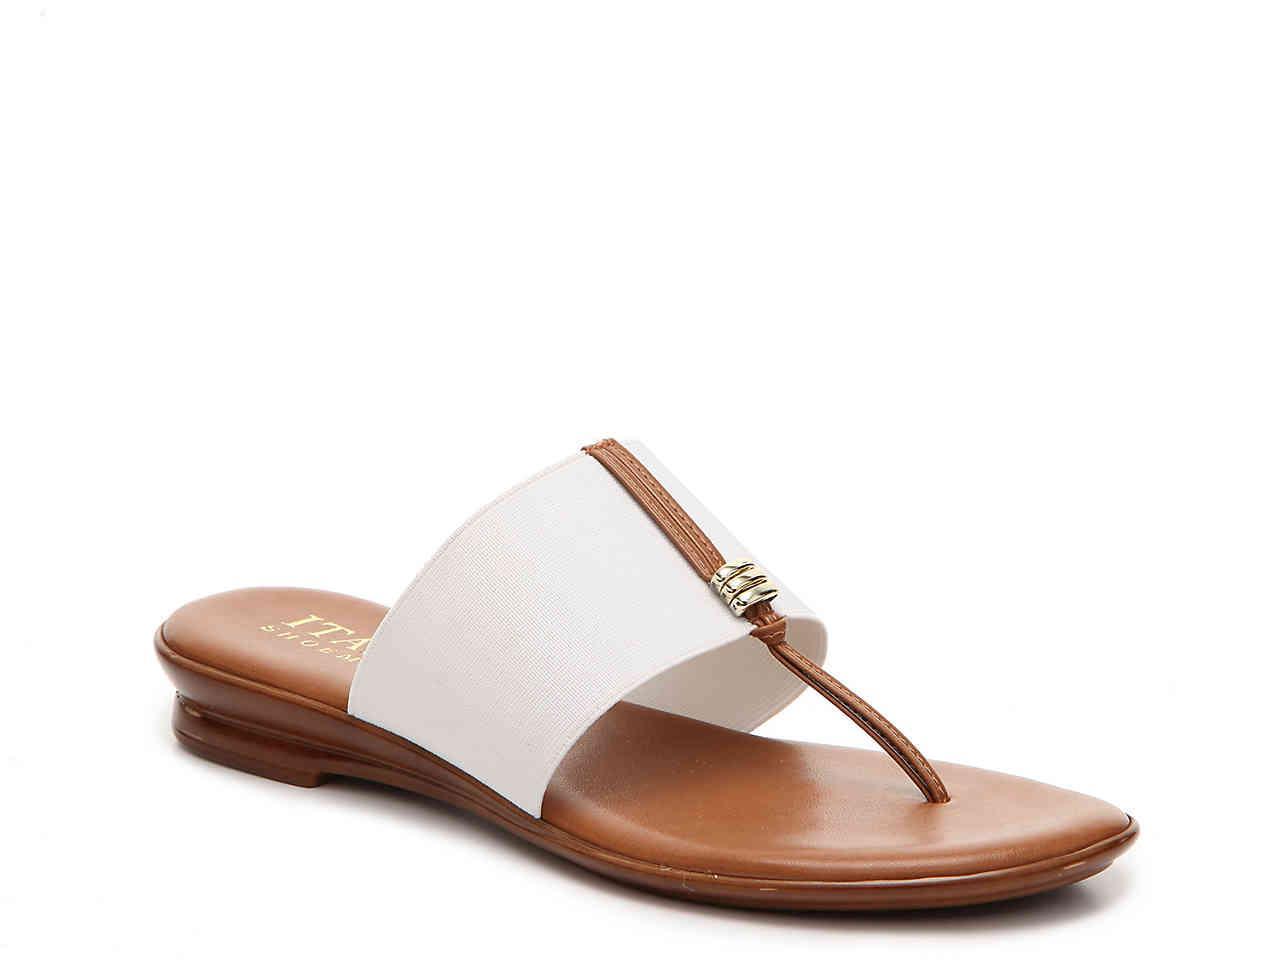 f502cf813865 Lyst - Italian Shoemakers Sutton Sandal in White